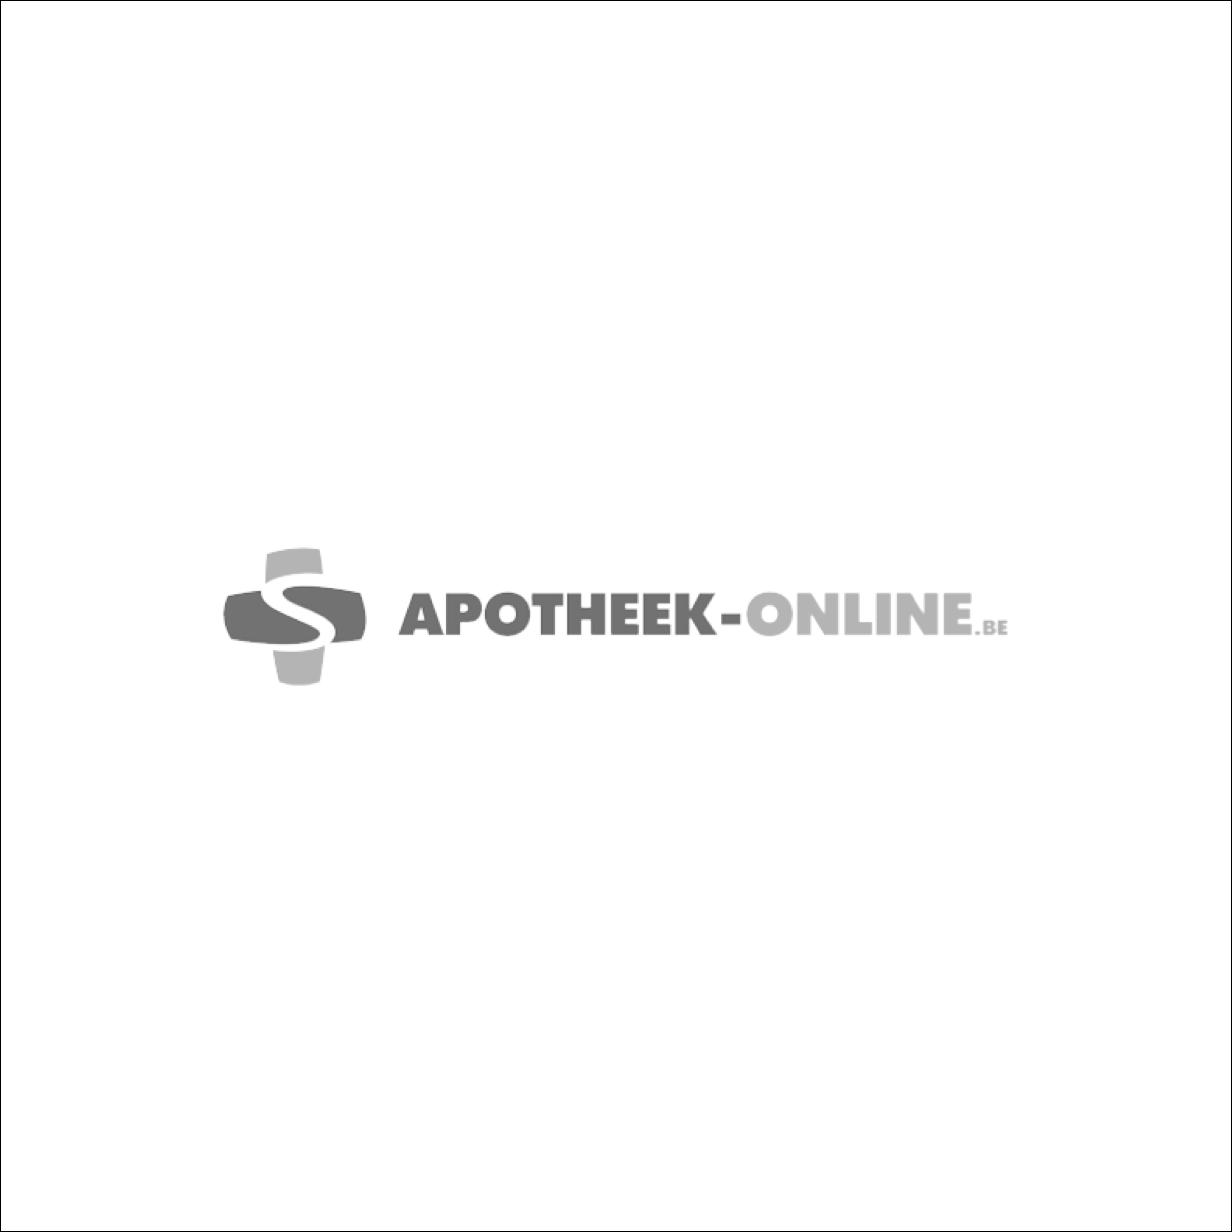 Mollelast Haft Bande Adh Latex Free 10cmx 4m 89593